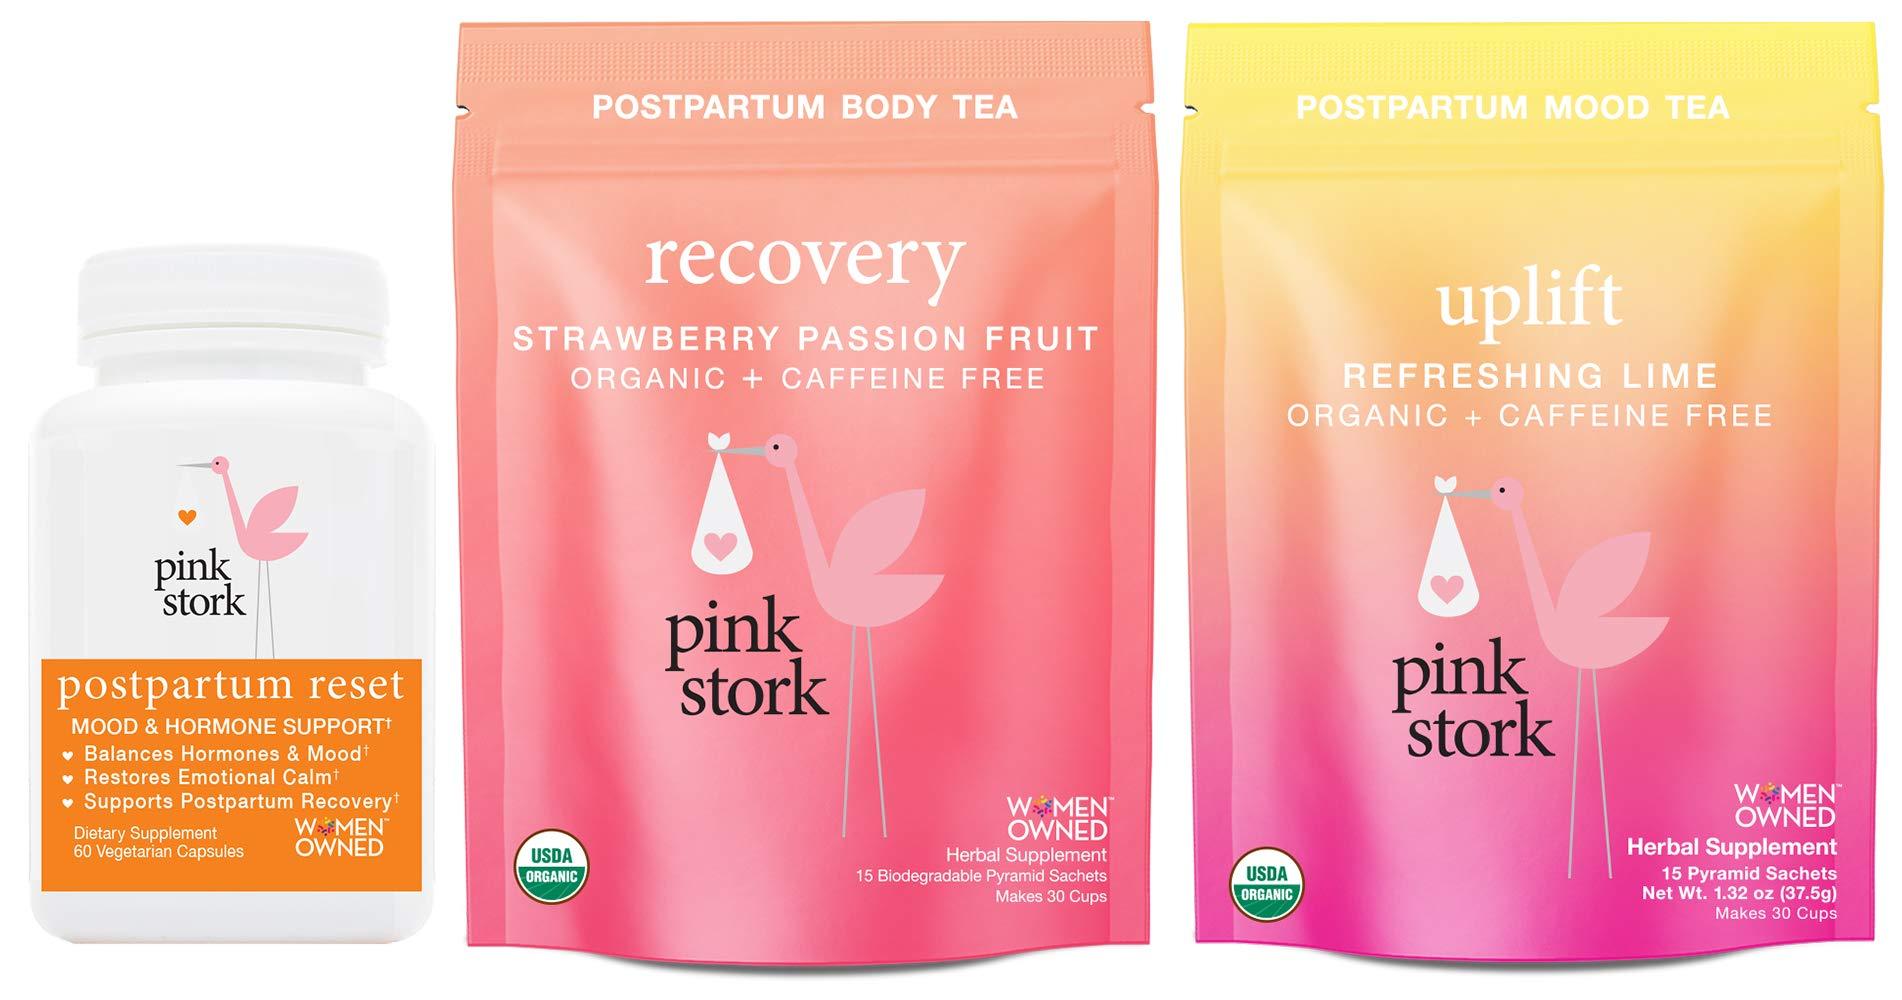 Pink Stork Postpartum Bundle: Postpartum Reset, Uplift Tea, Recovery Tea -Supports Hormones, Encourages Emotional Calm, Restores Nutrients by Pink Stork